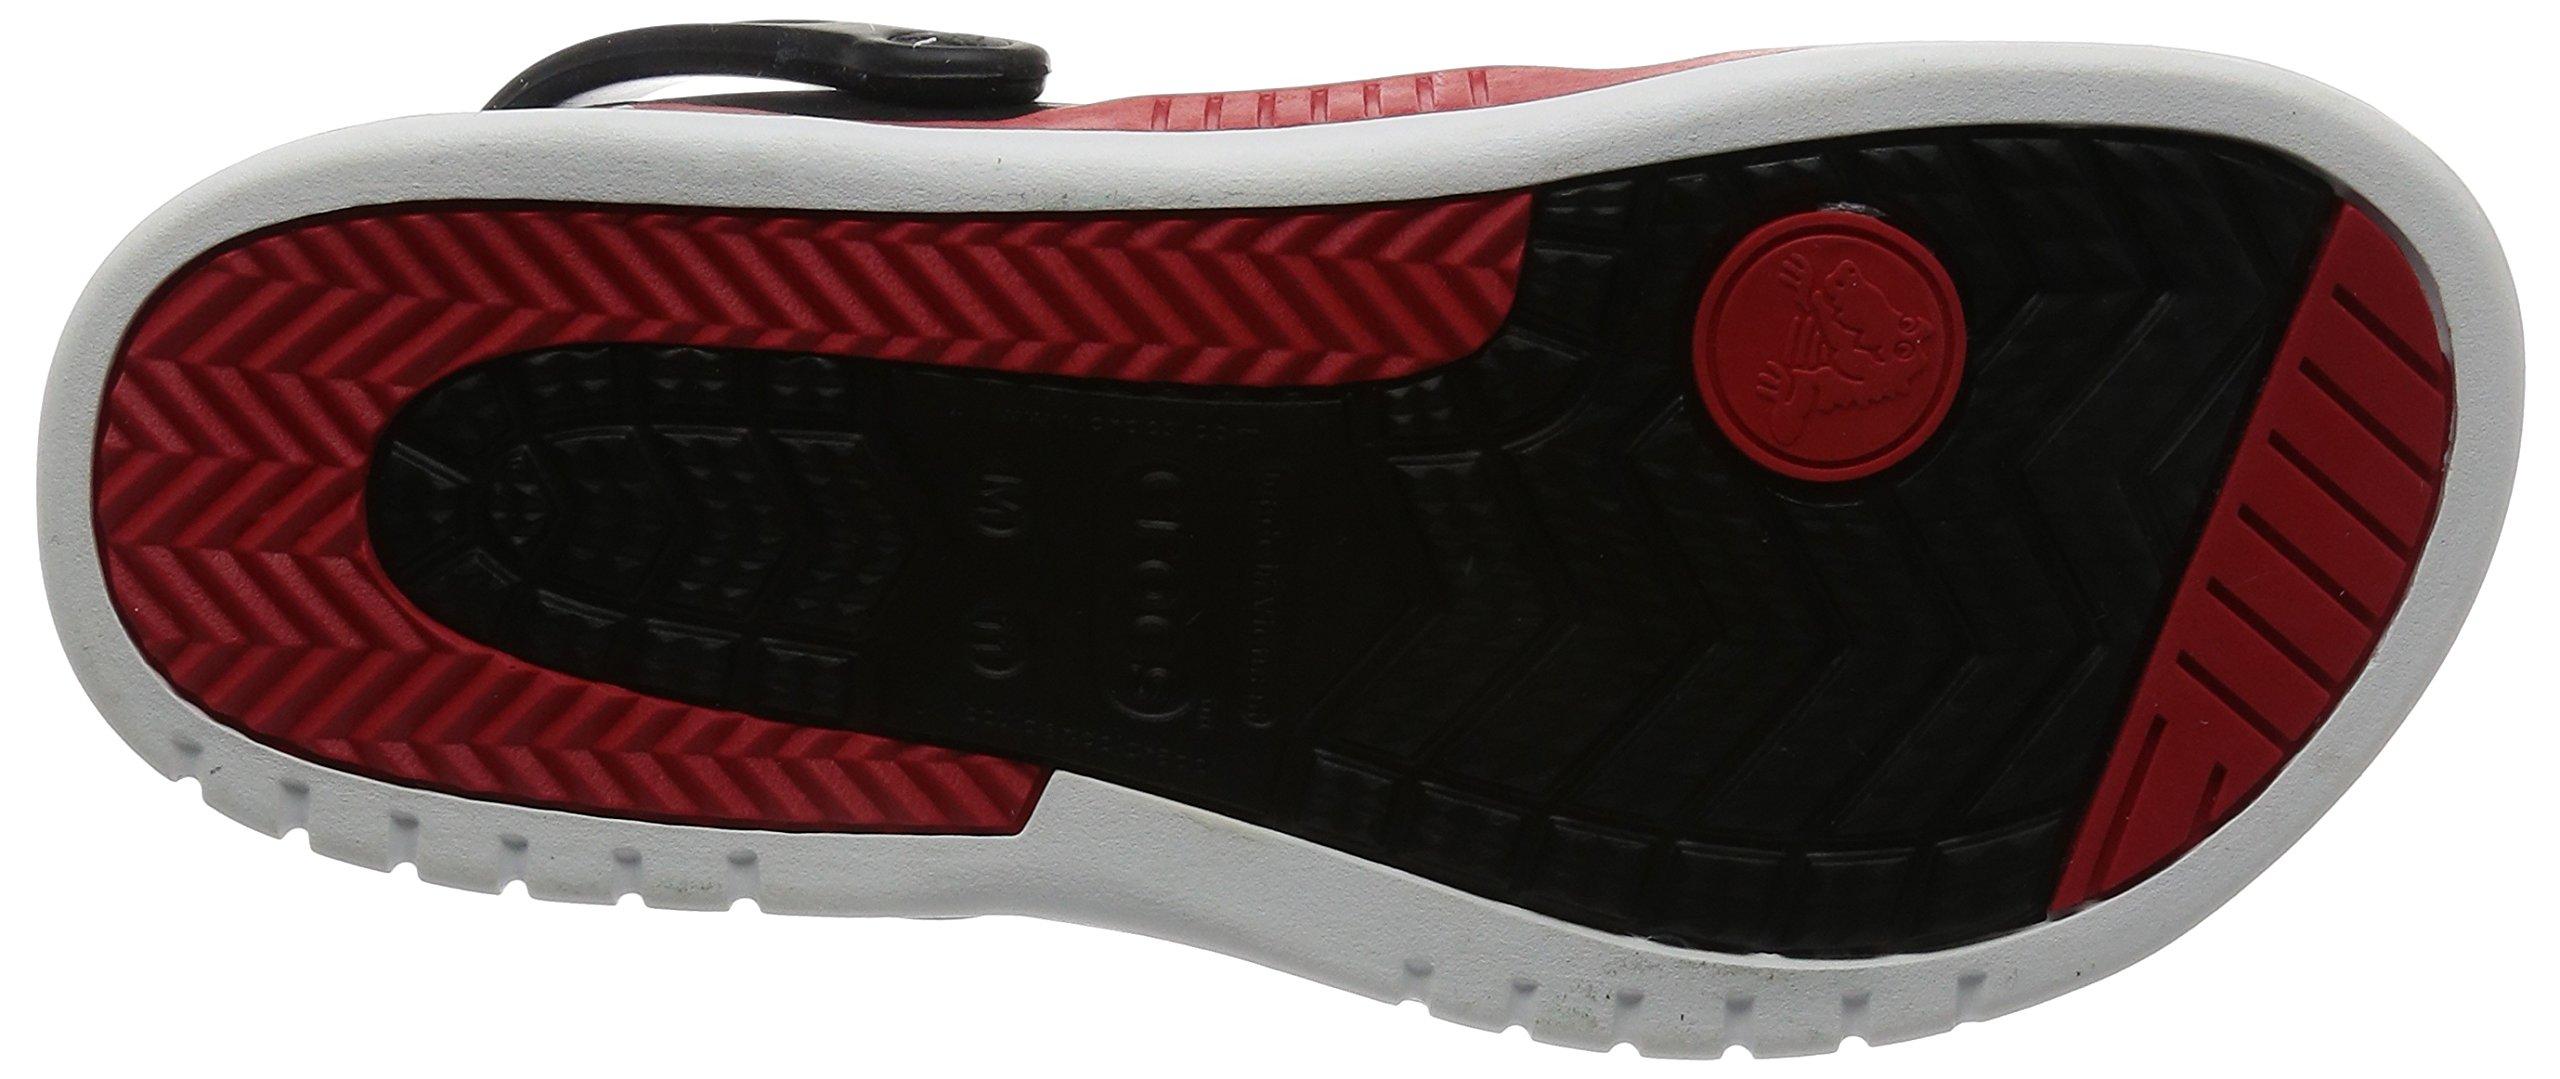 Crocs Men's 14300 Front Court Clog, Black/Red, 10 M US by Crocs (Image #3)